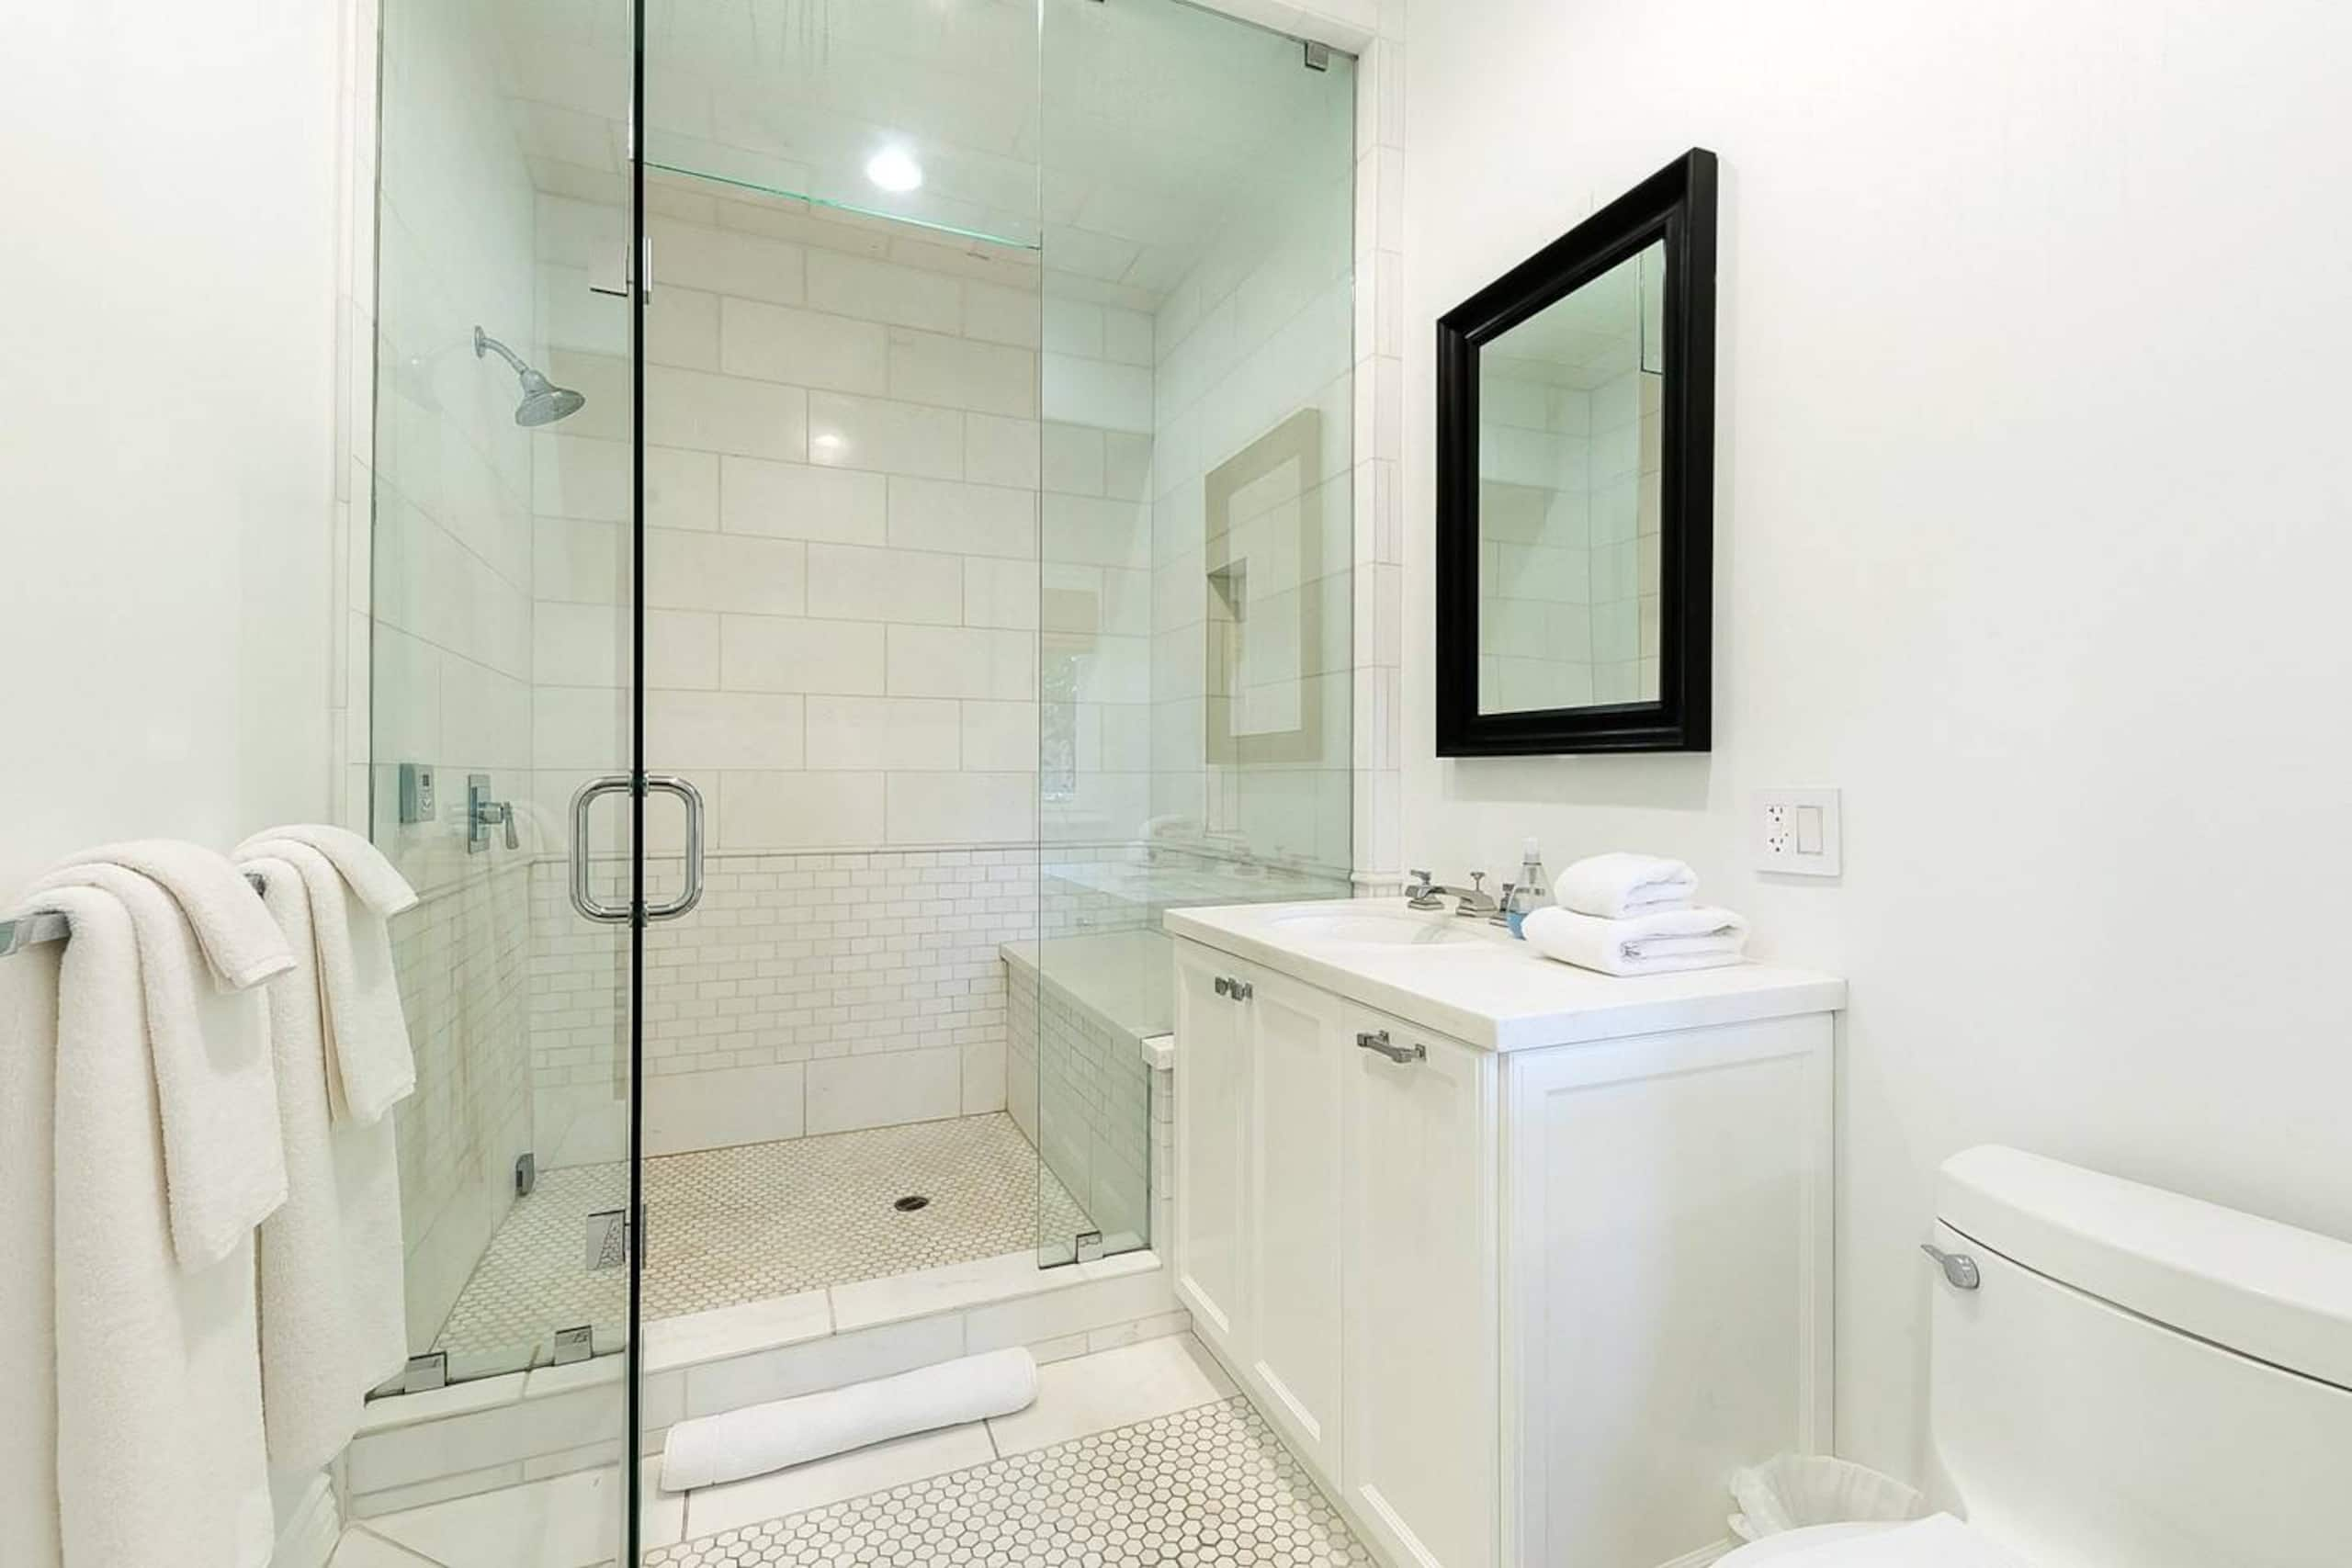 Apartment Villa Shawaiz - Beachfront Villa with 5 beds  photo 20210633